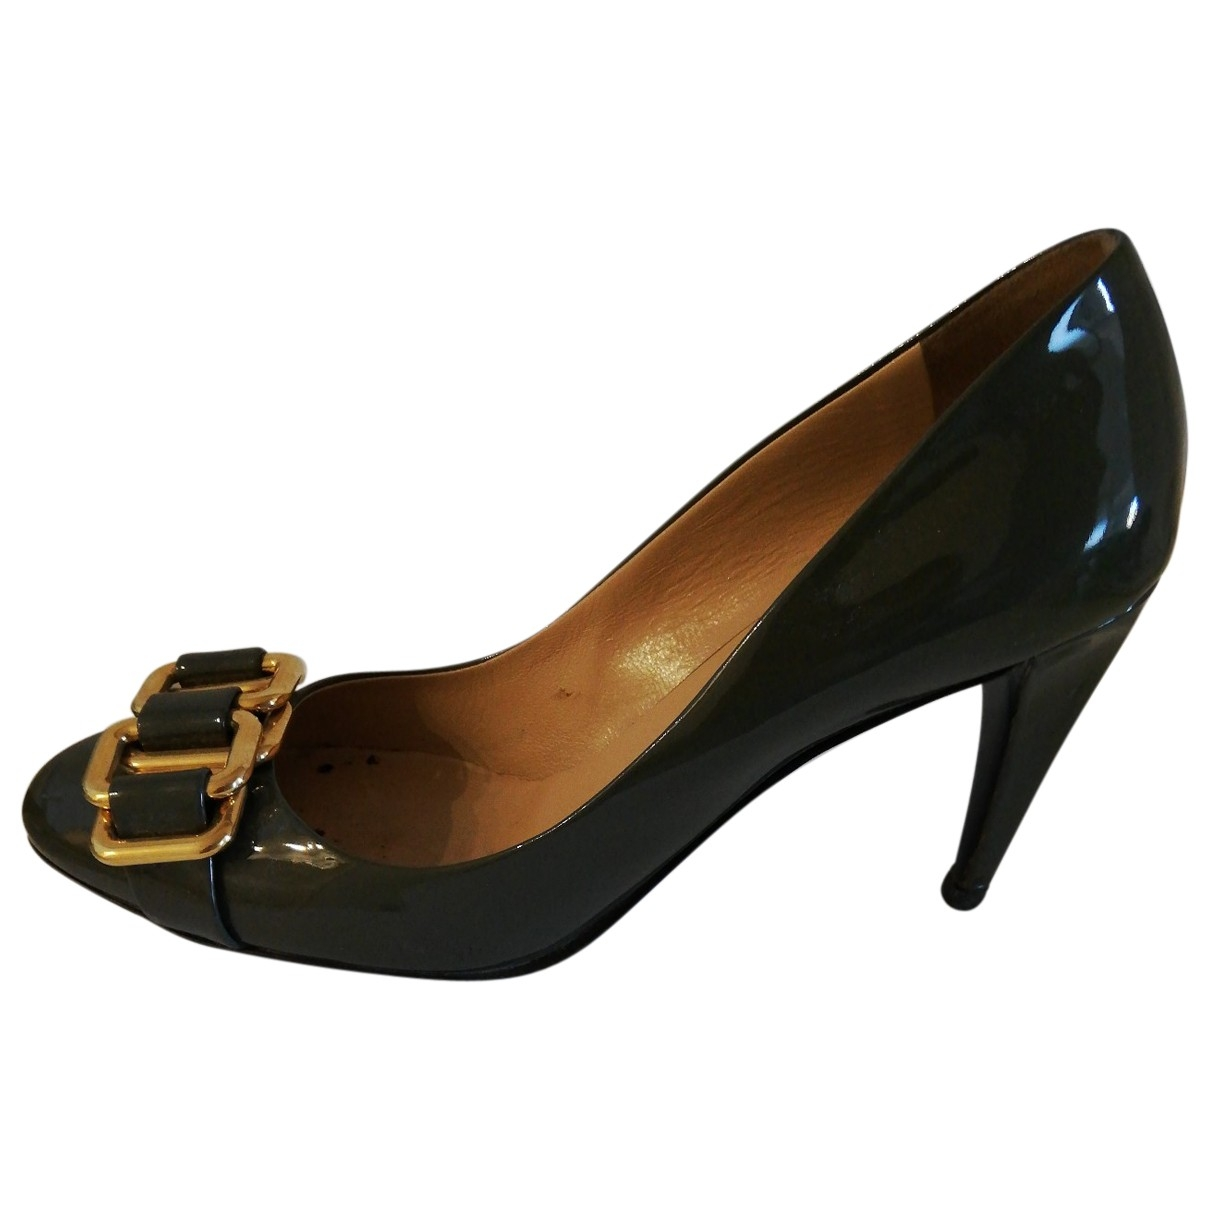 Miu Miu \N Grey Patent leather Heels for Women 40.5 EU